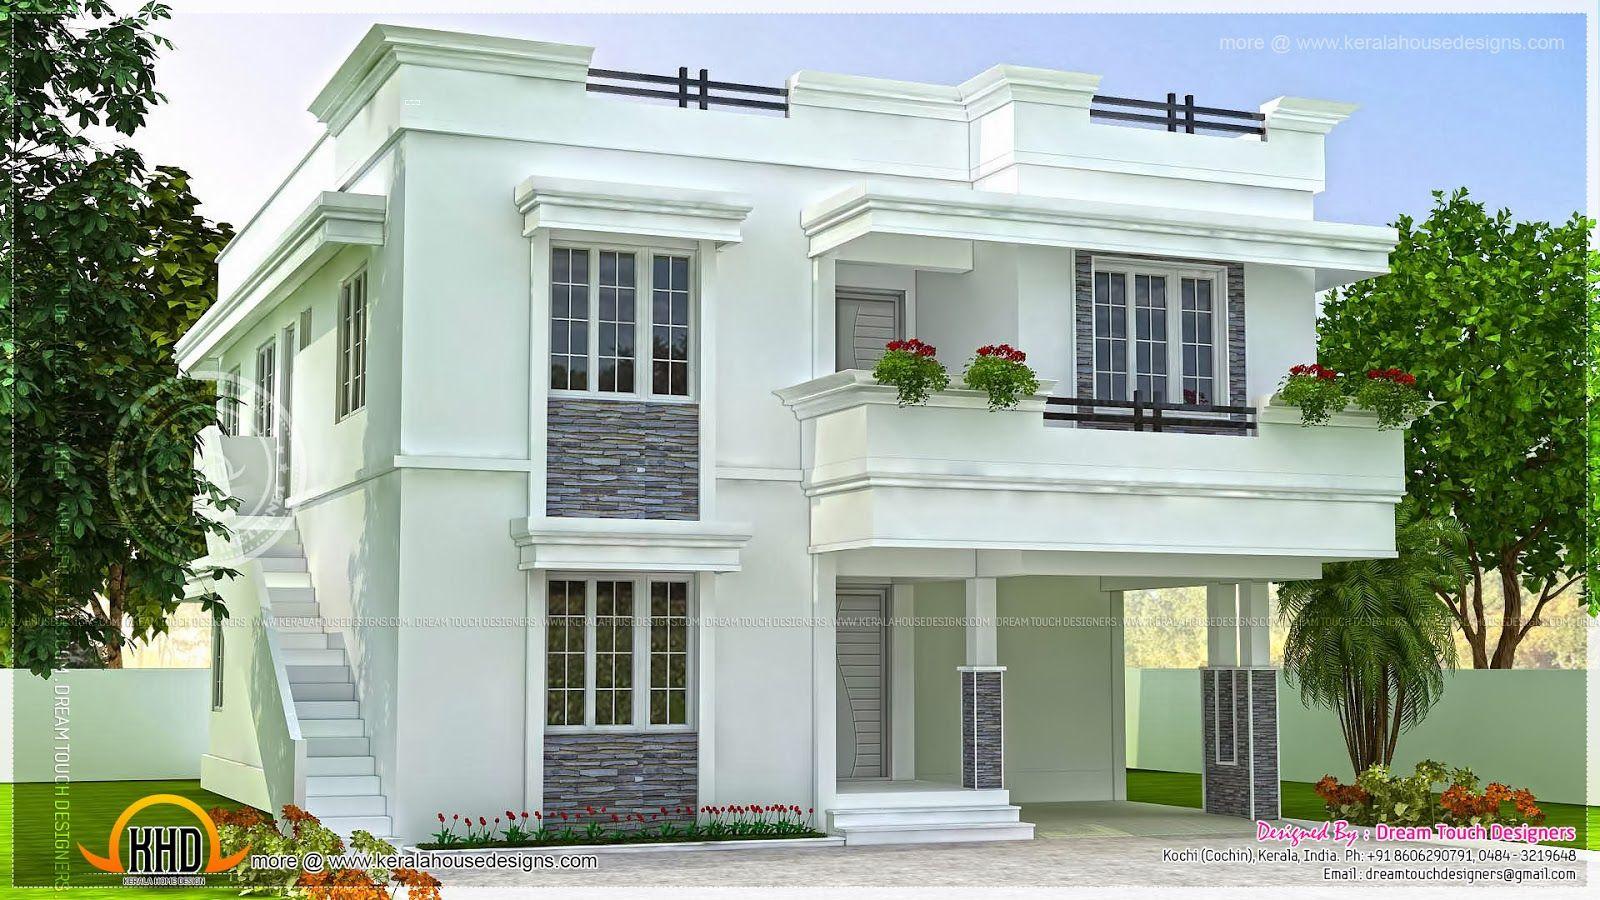 beautiful house designs - rent on flat in noida #flatonrent #renting THKDMTB